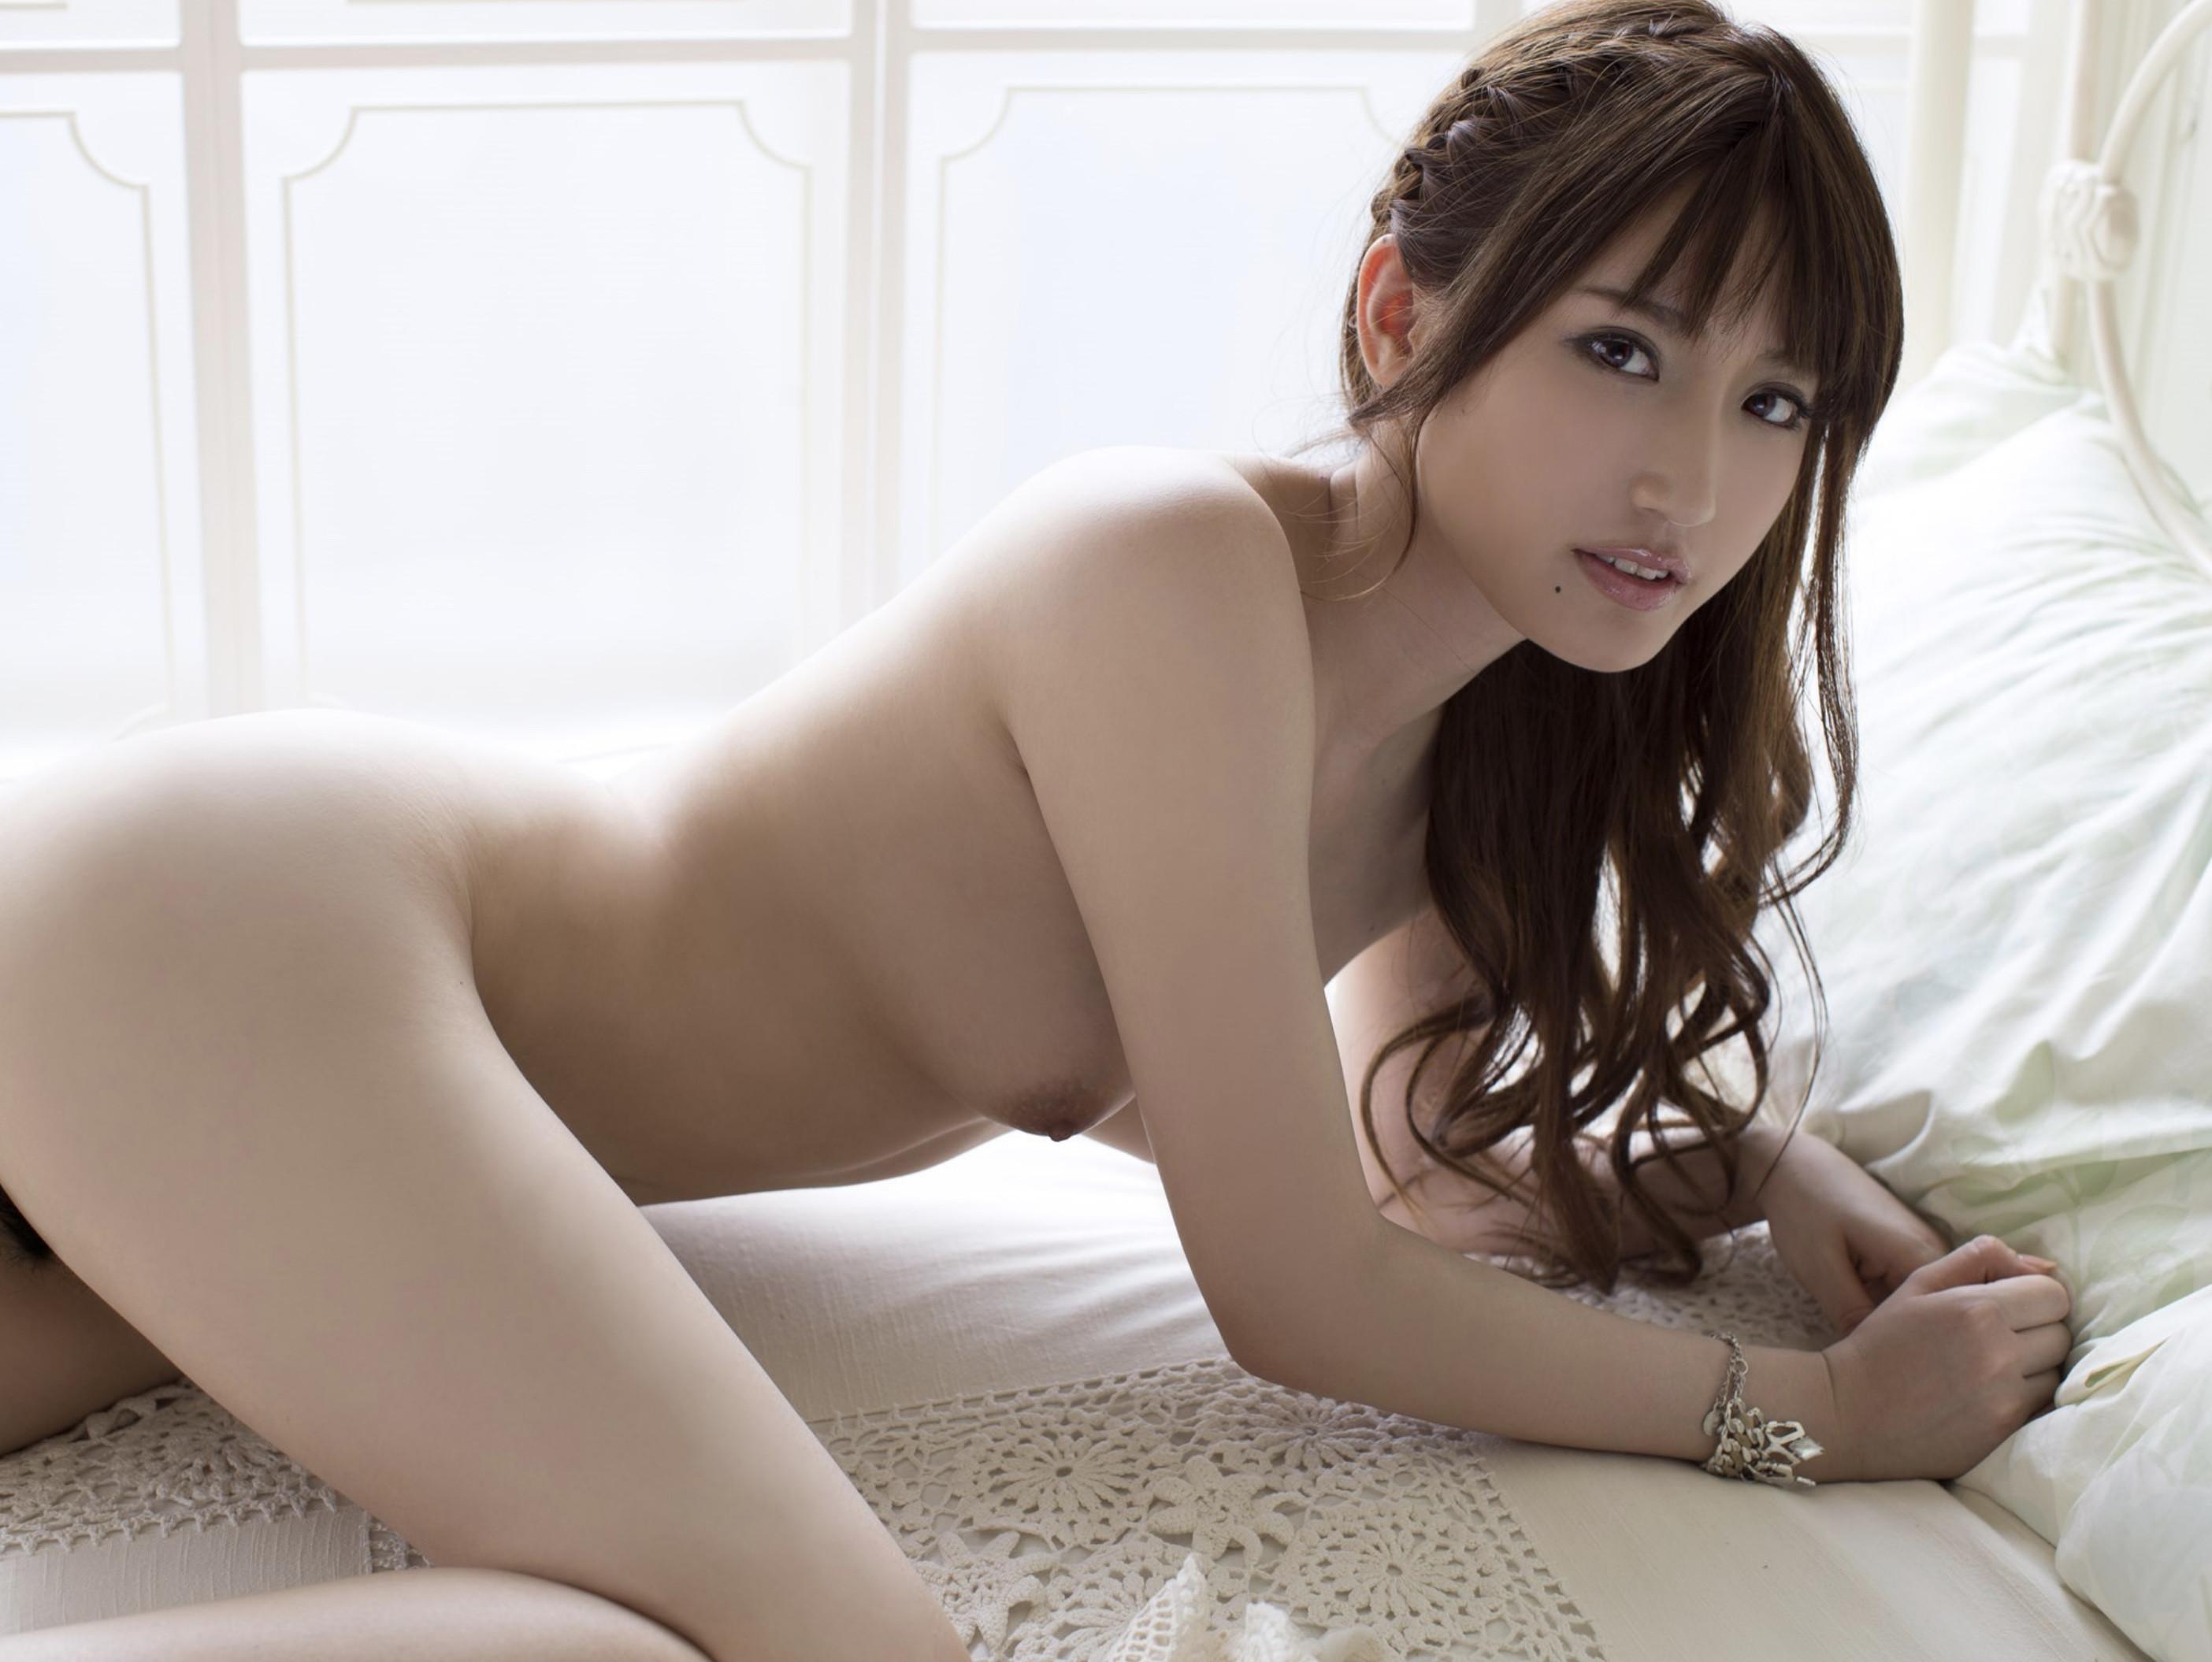 AVデビュー直前ヌード 愛沢かりん photo 024